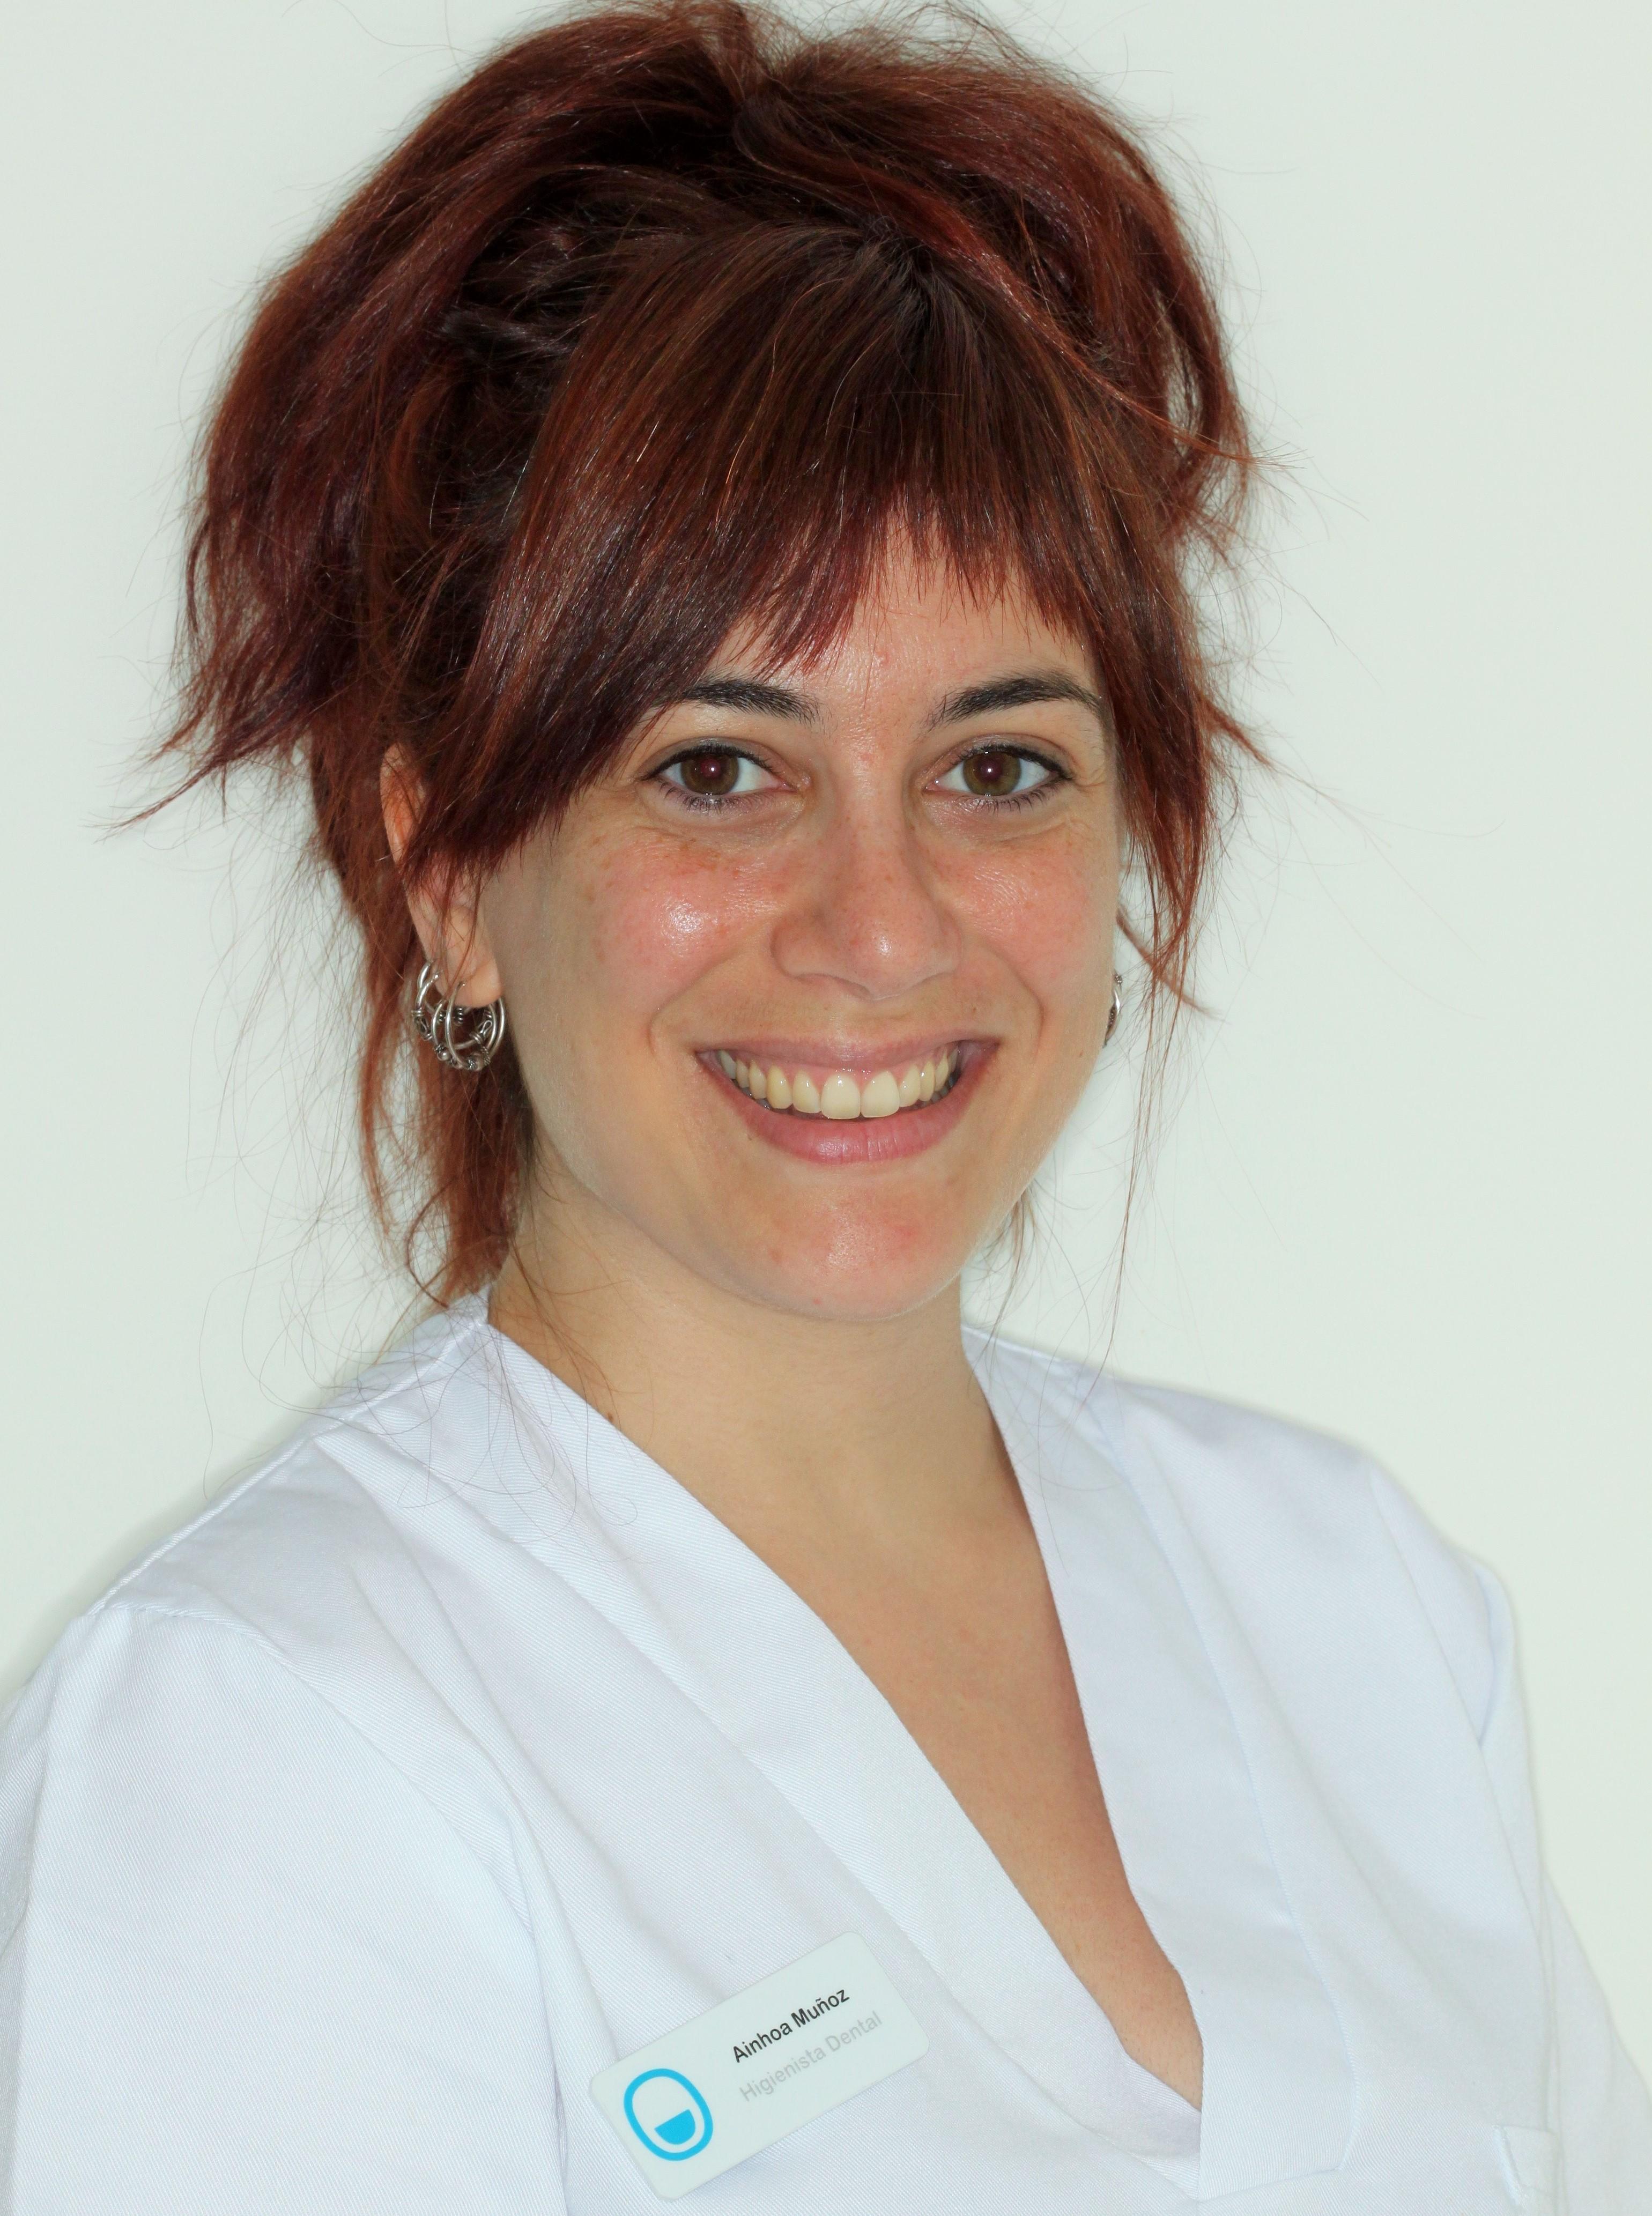 Ainhoa Muñoz